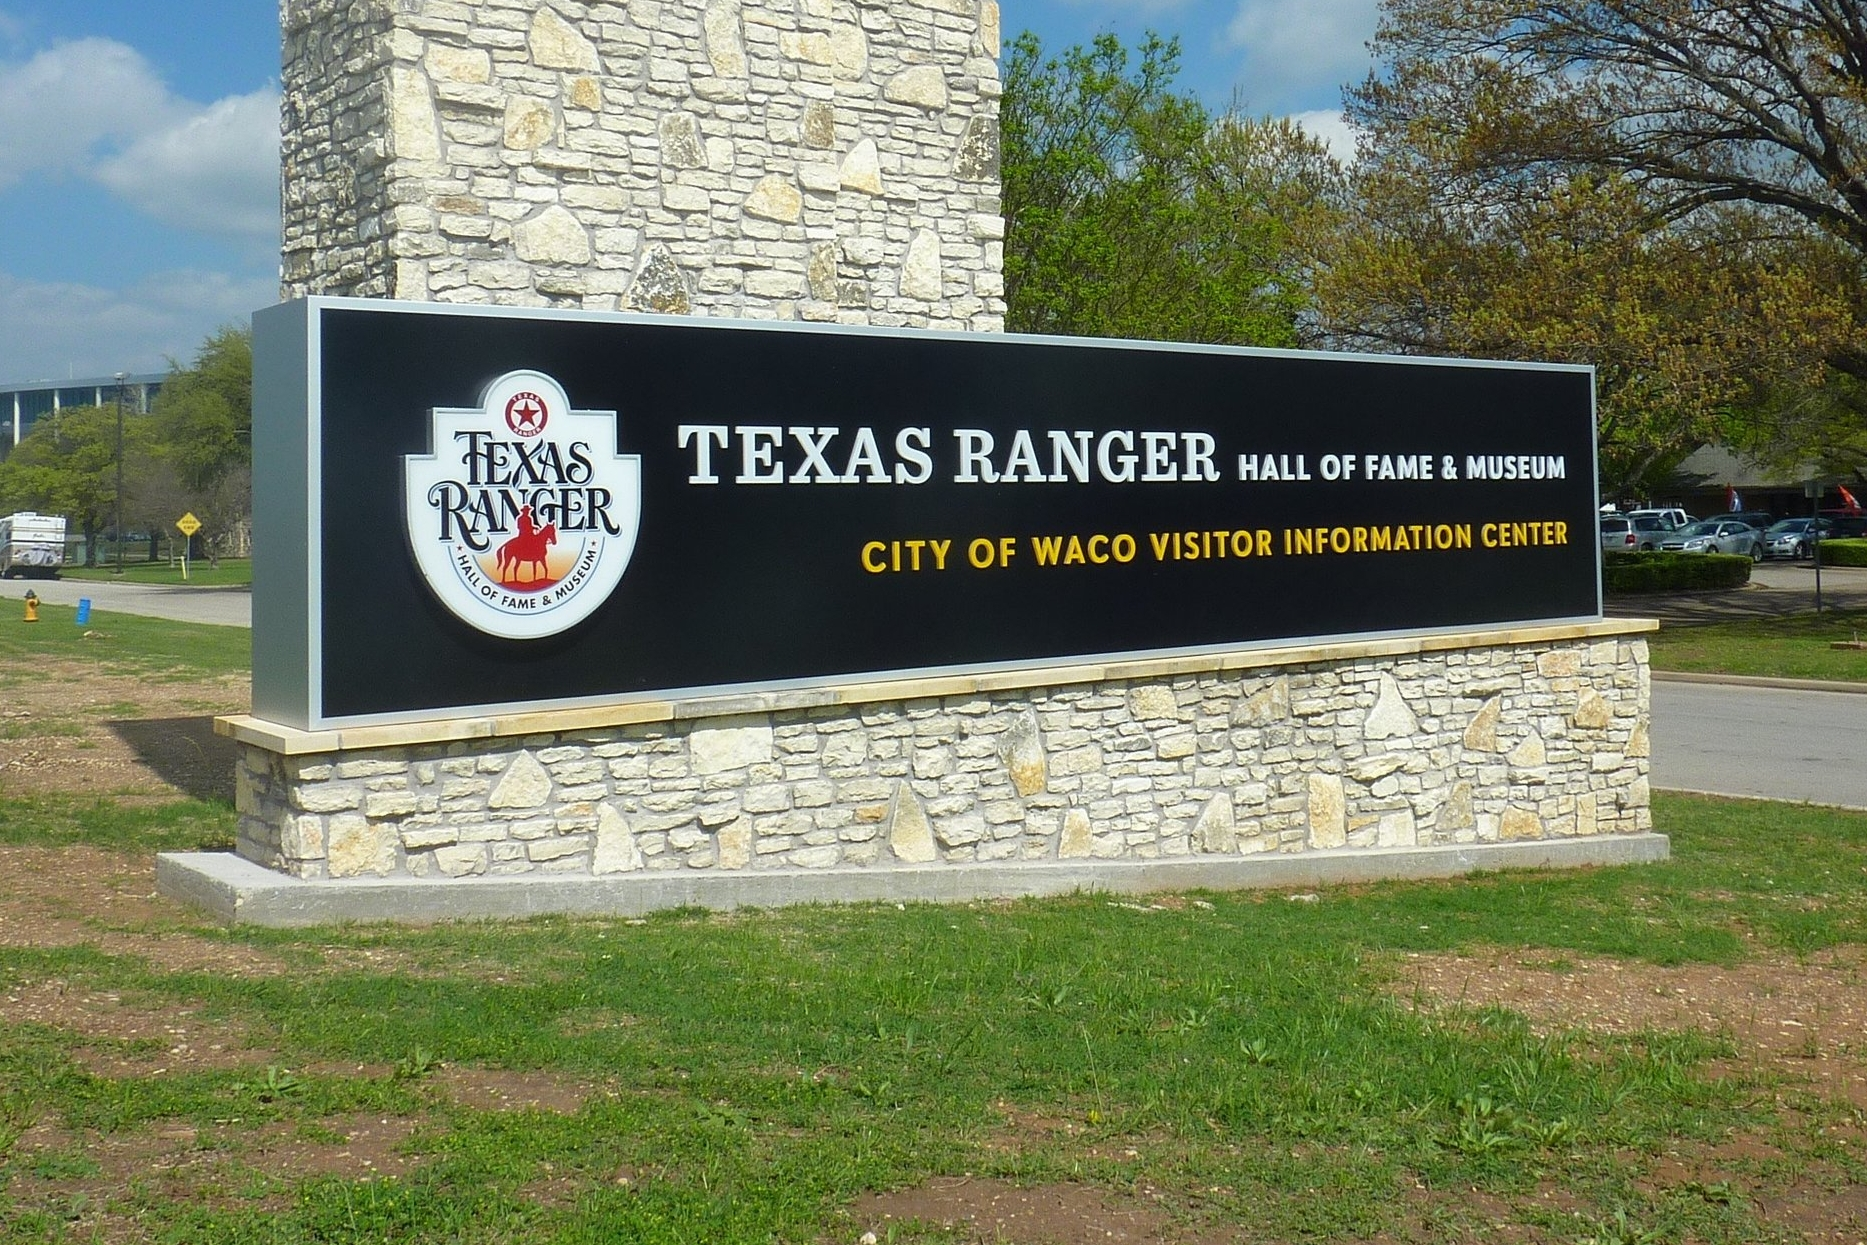 Texas Ranger Hall of Fame & Museum